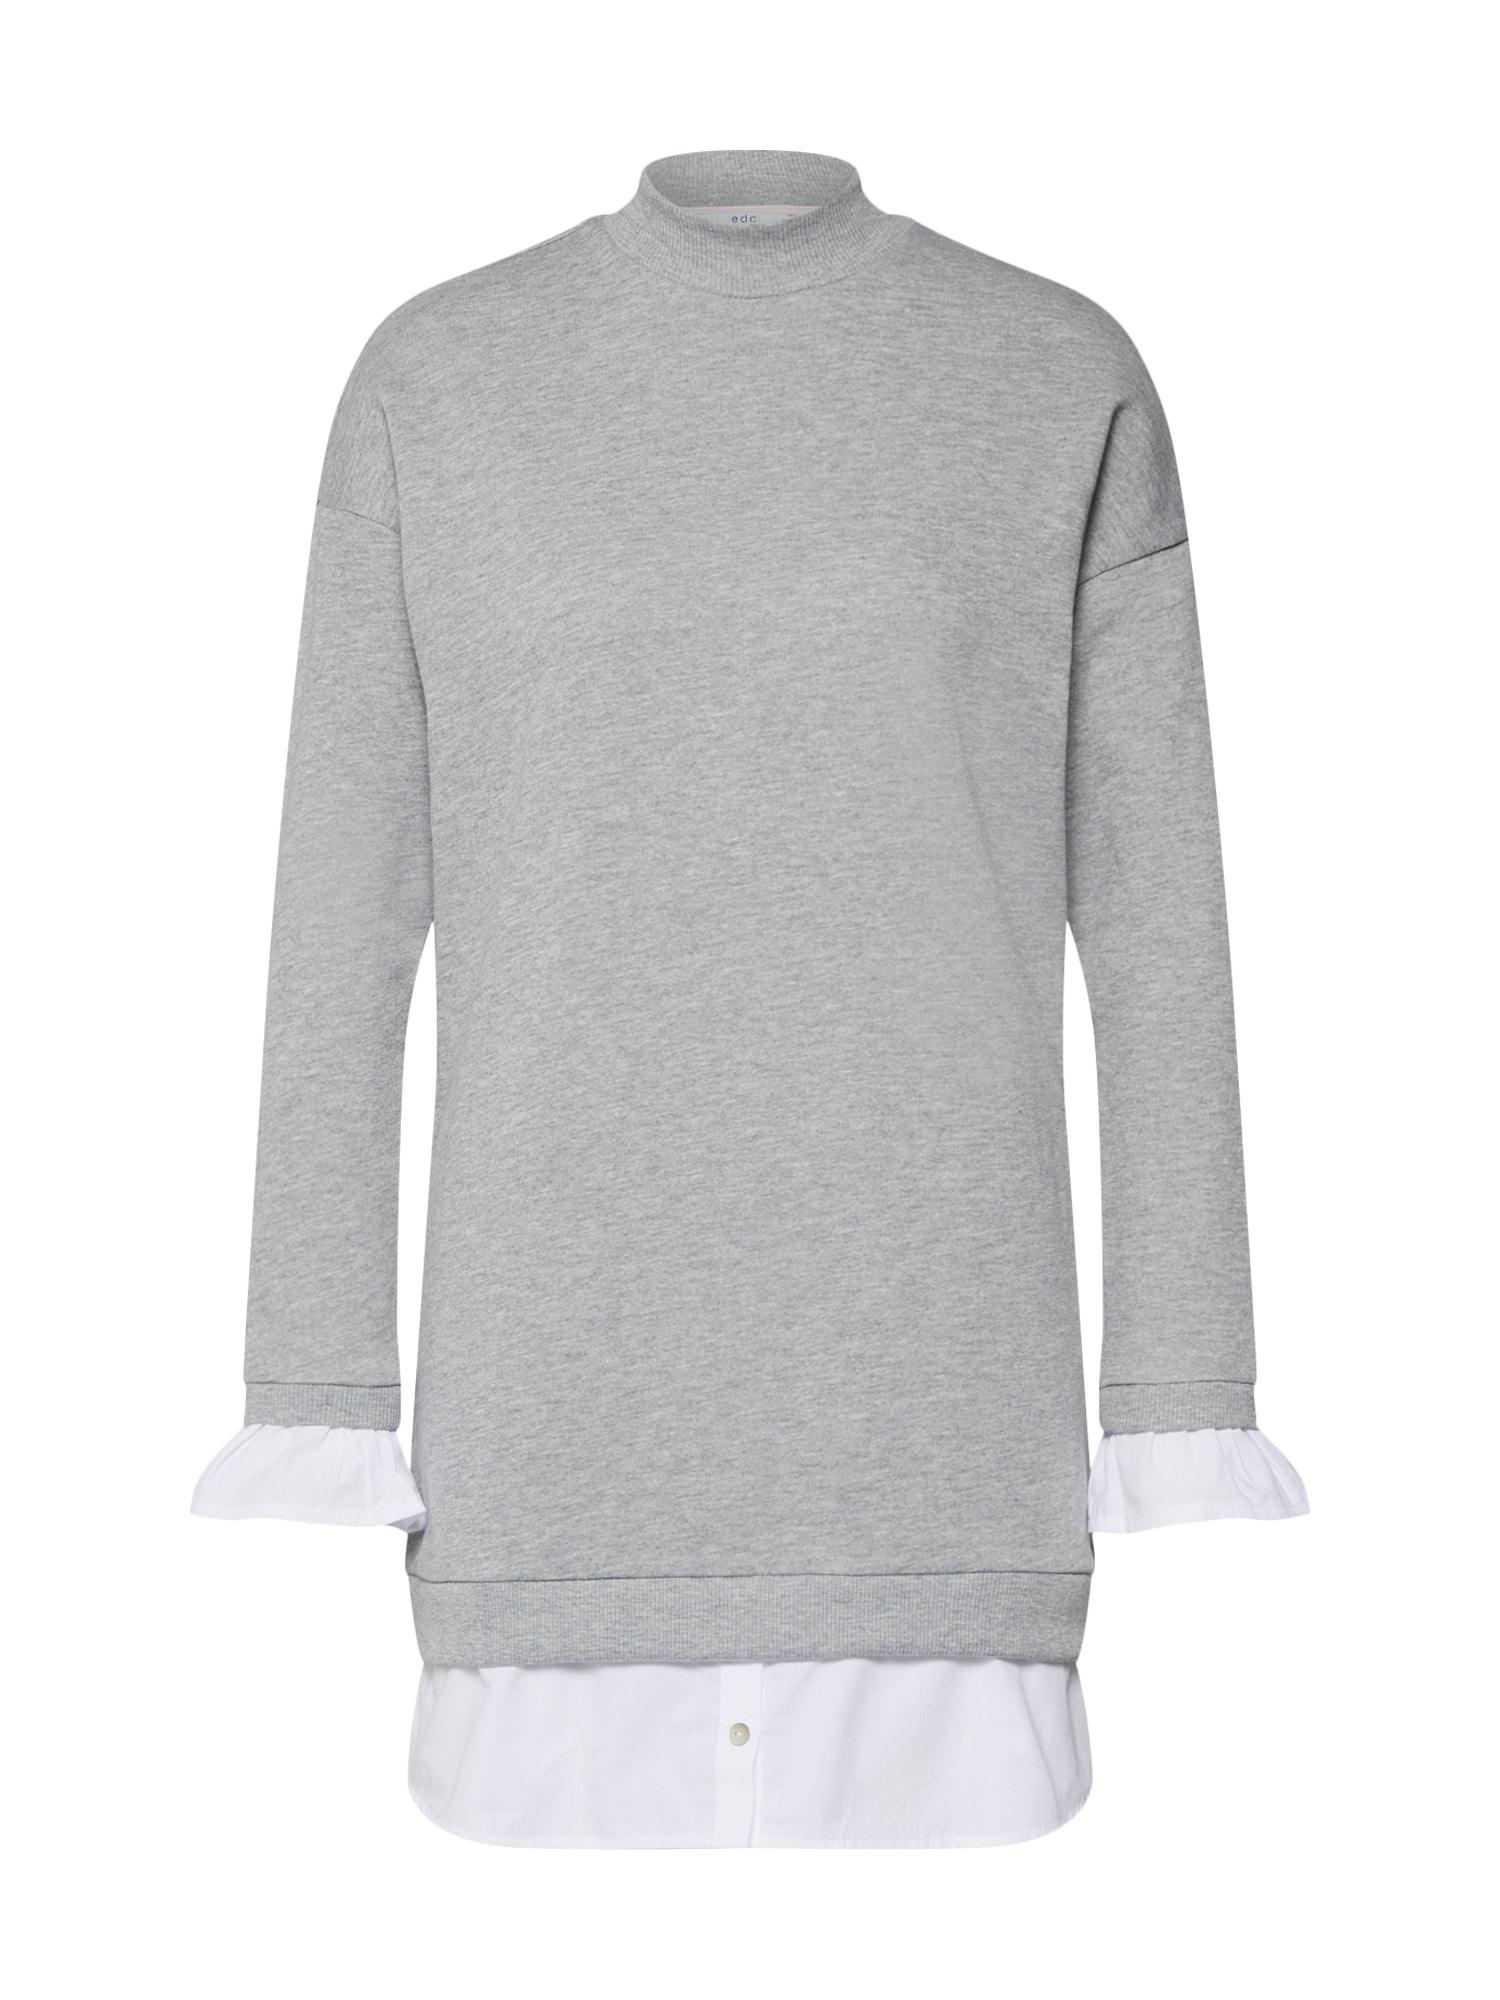 Šaty EOS sweatdress Dresses knitted šedá bílá EDC BY ESPRIT